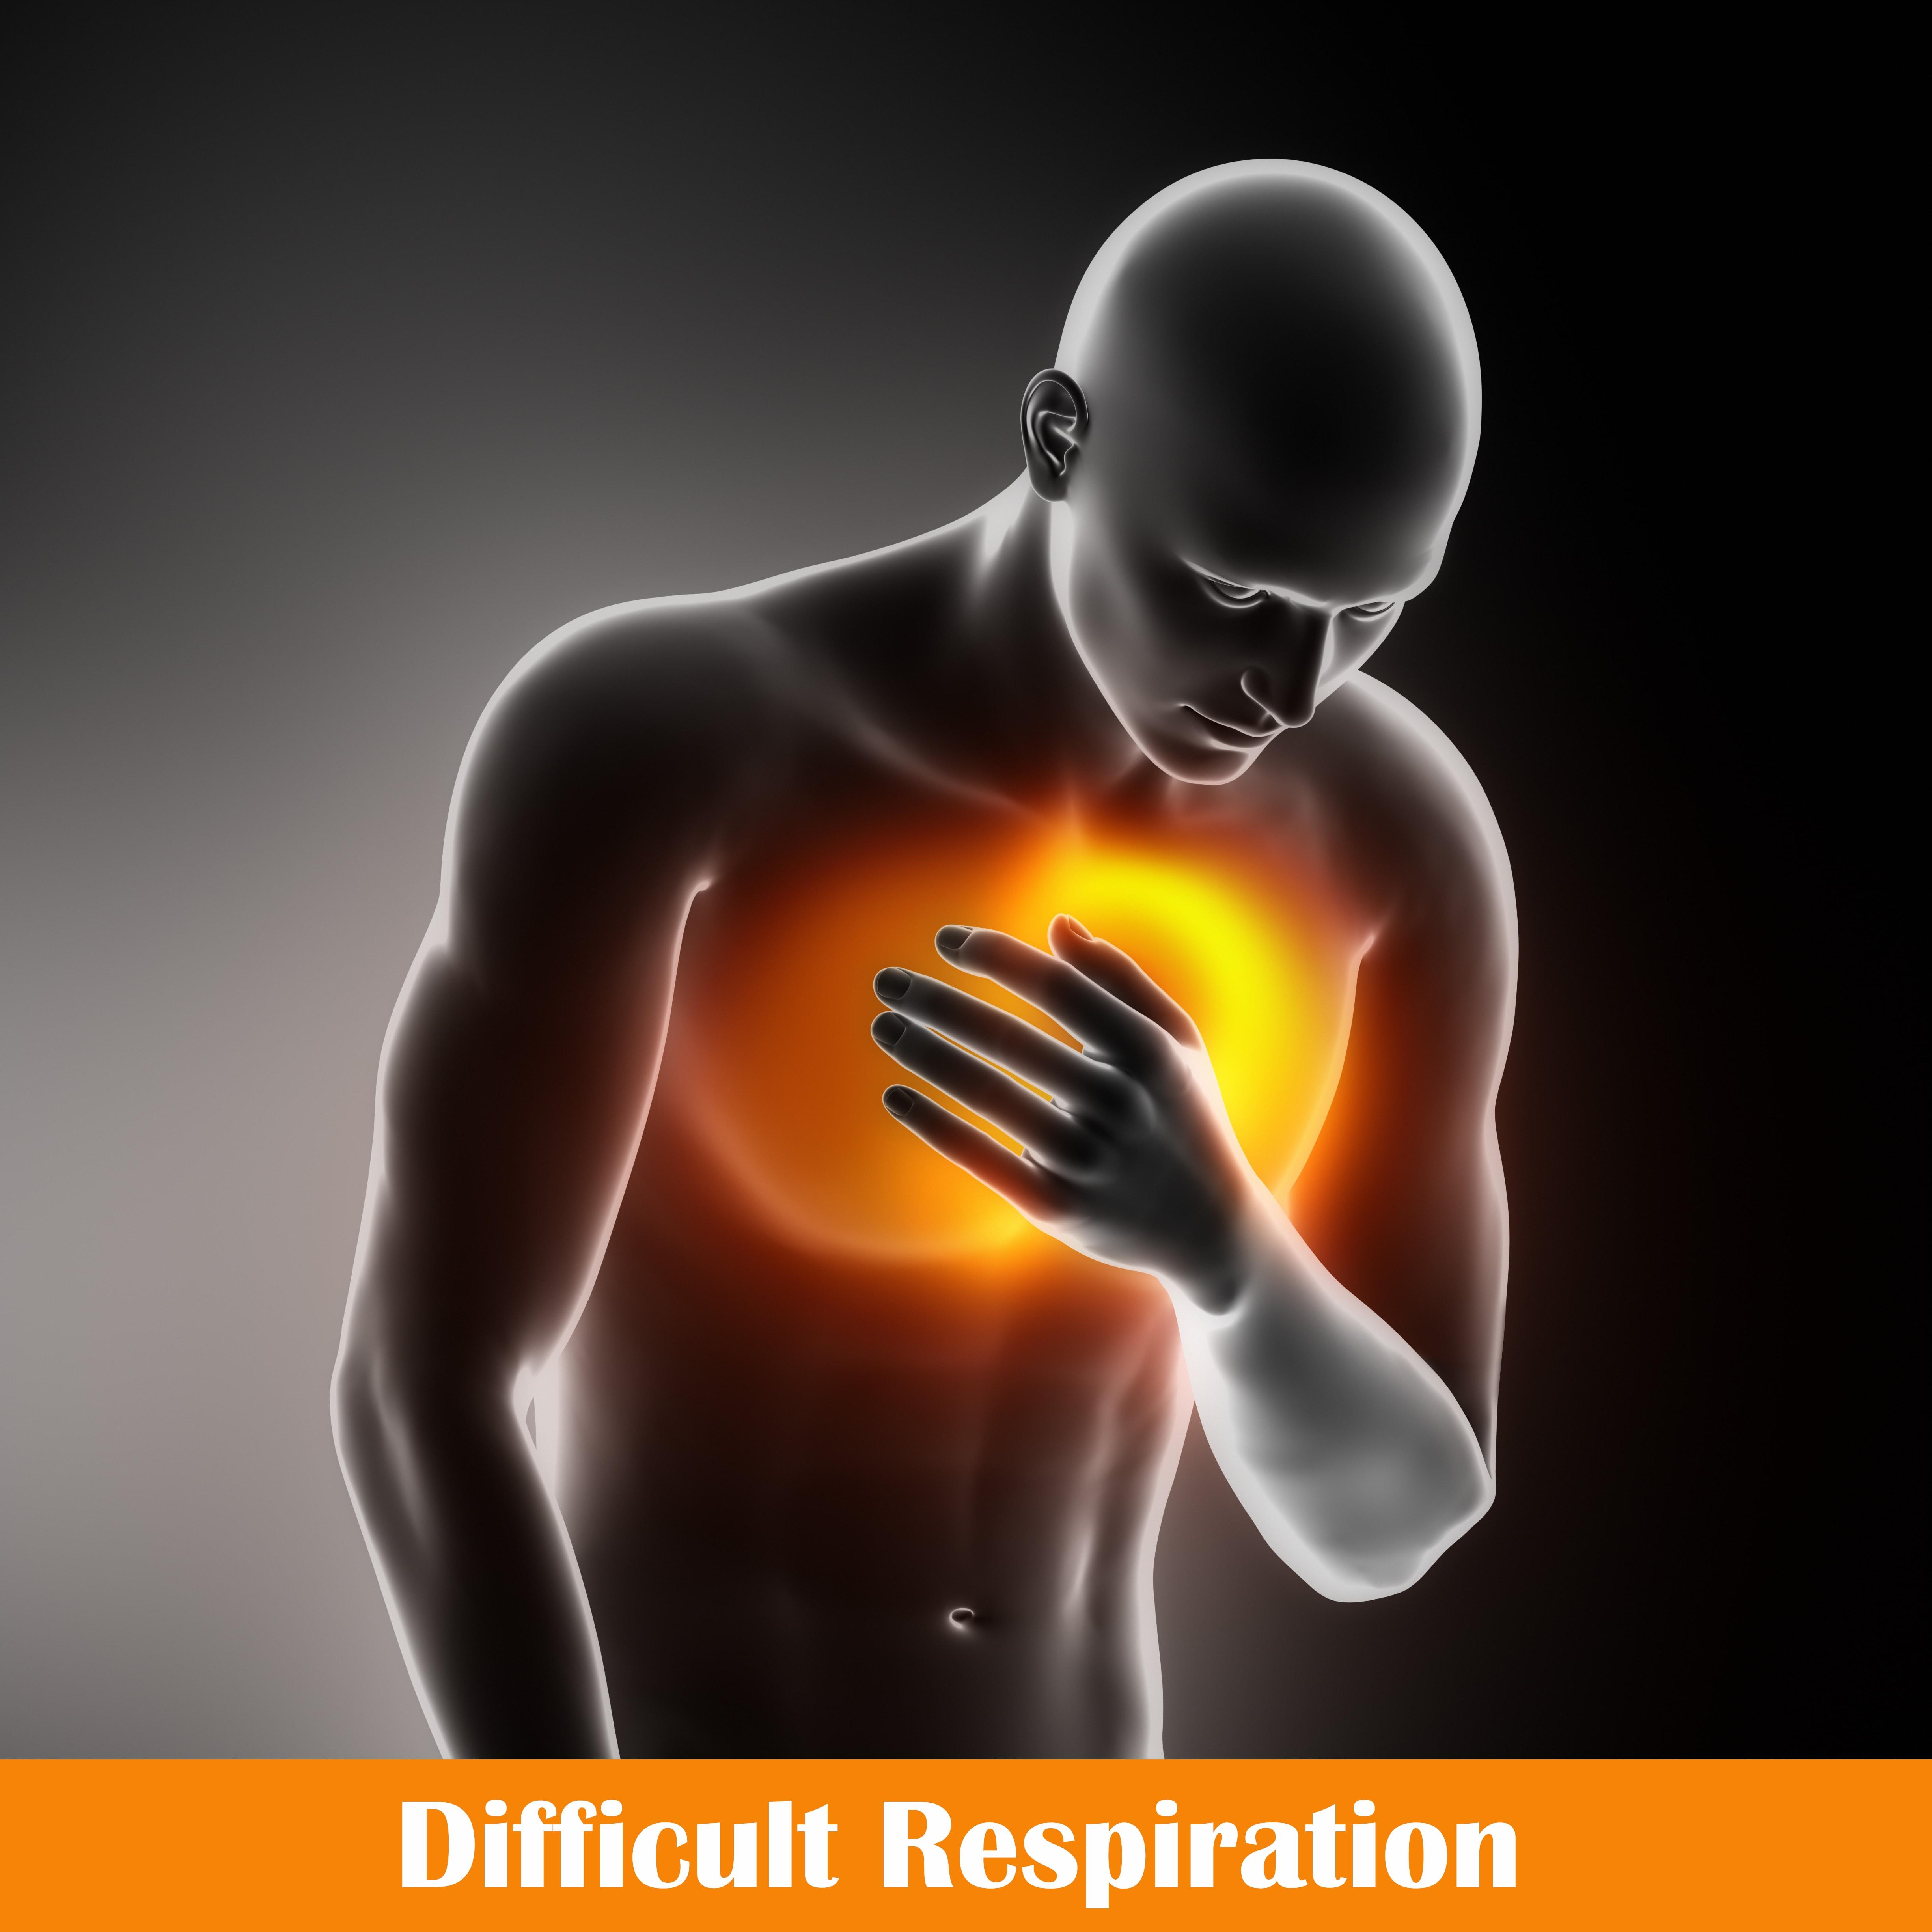 Difficult Respiration (dyspnoea)